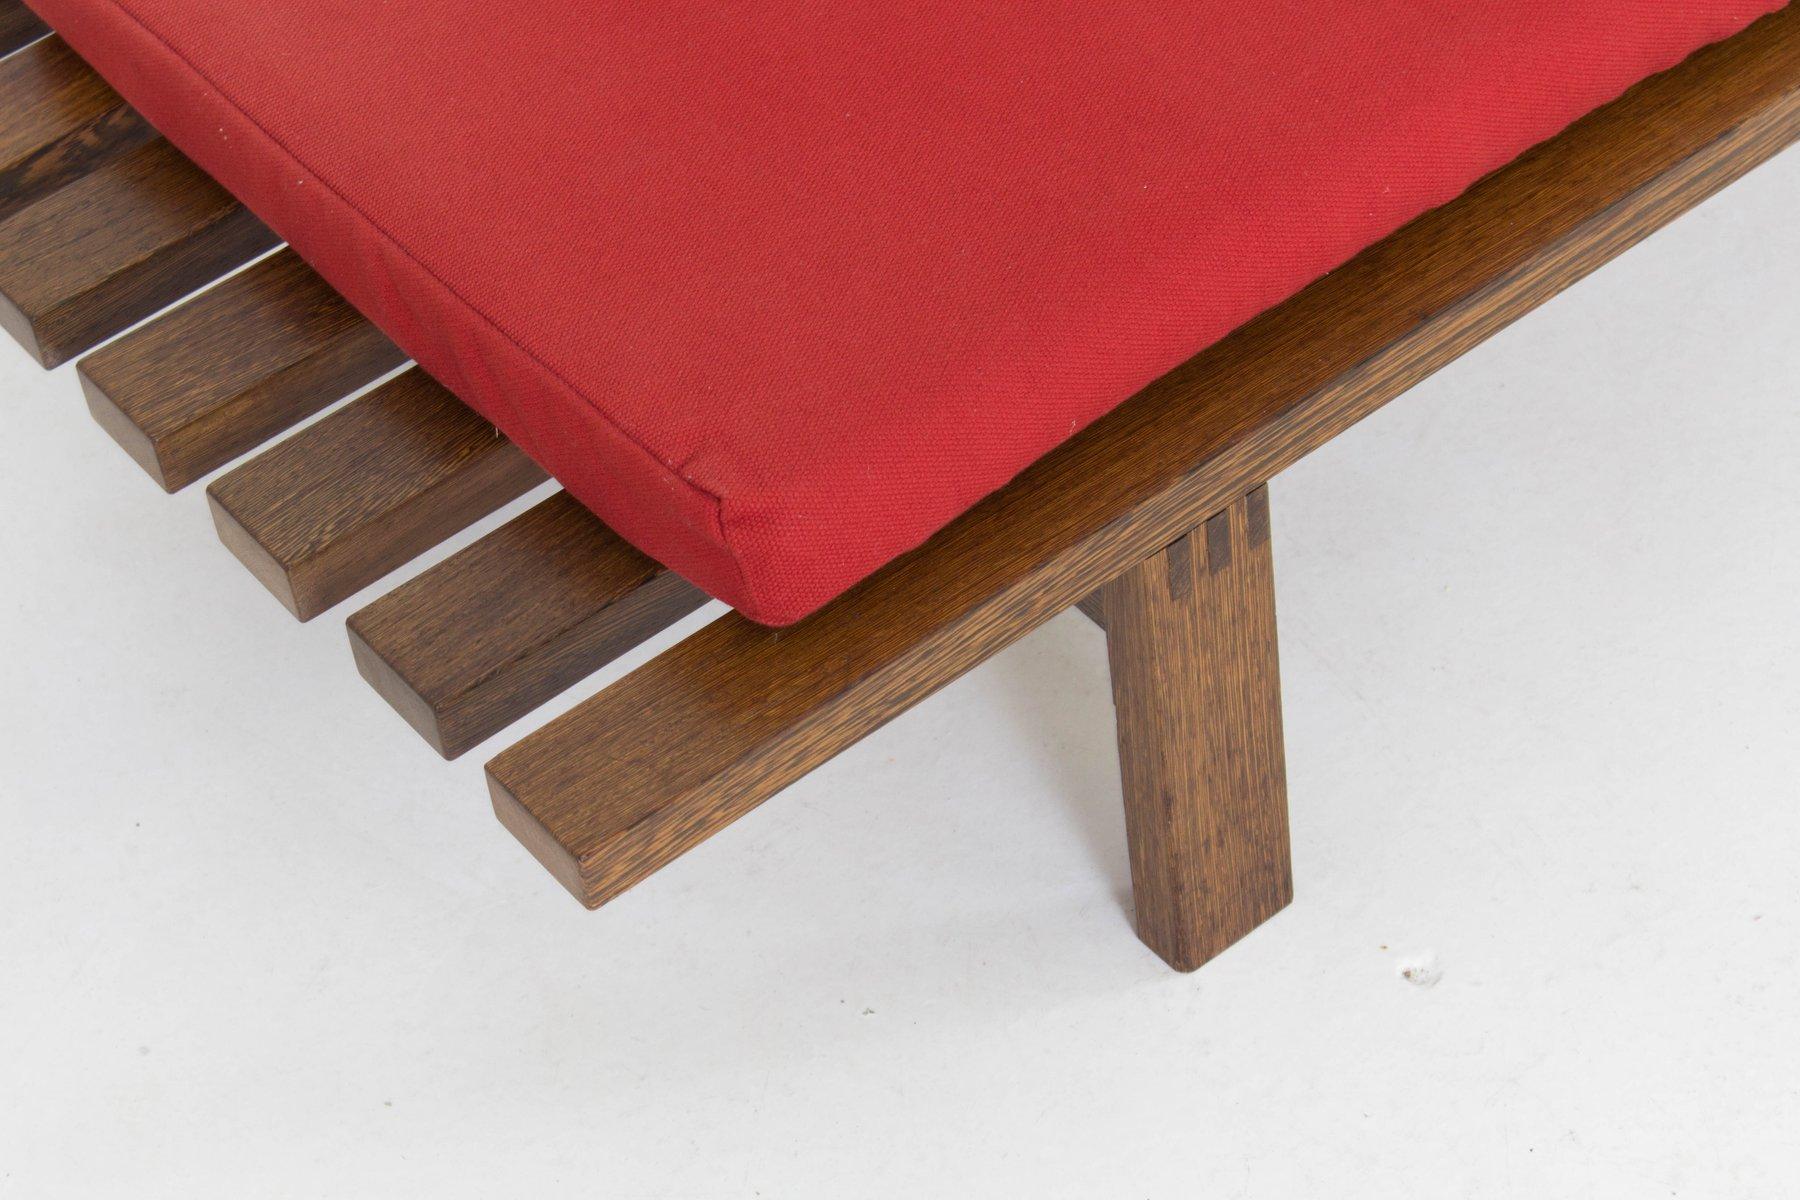 Mid Century Modern Slat Bench Part - 22: Mid-Century Large Modern Slat Bench By Martin Visser For U0027t Spectrum, 1960s